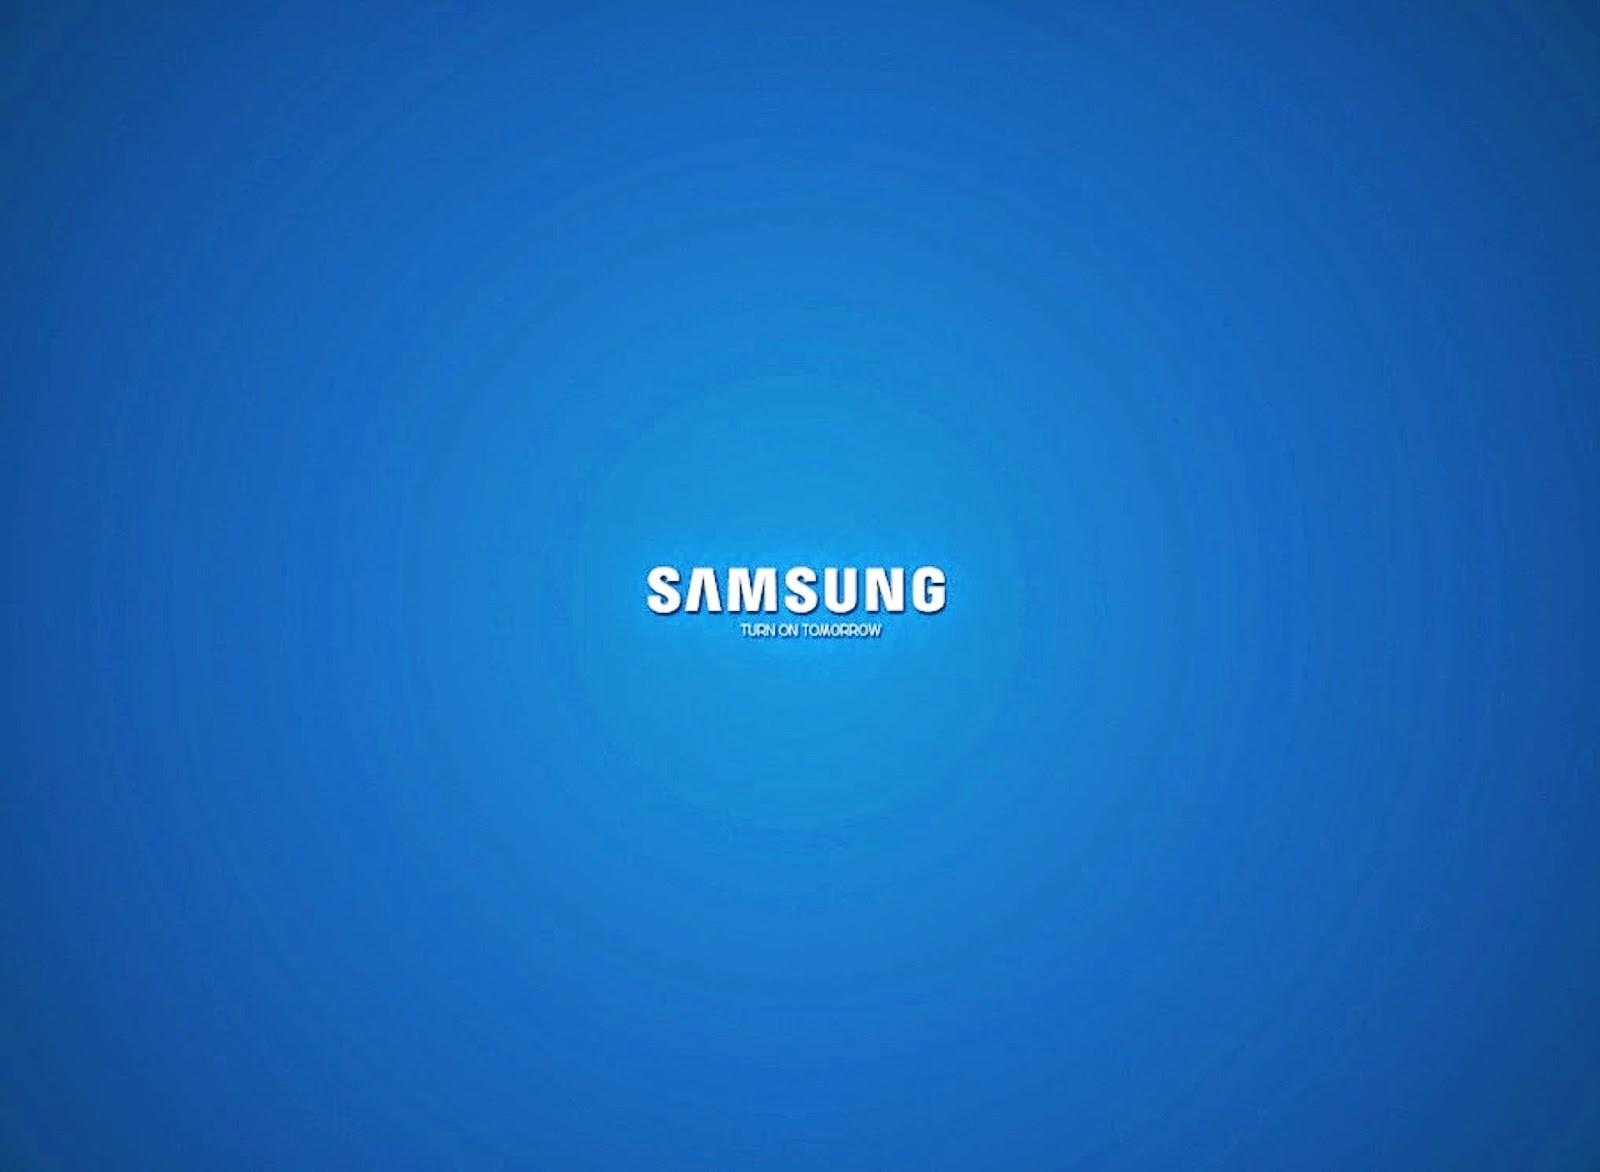 Samsung Galaxy A Wallpaper Free Download 1600x1172